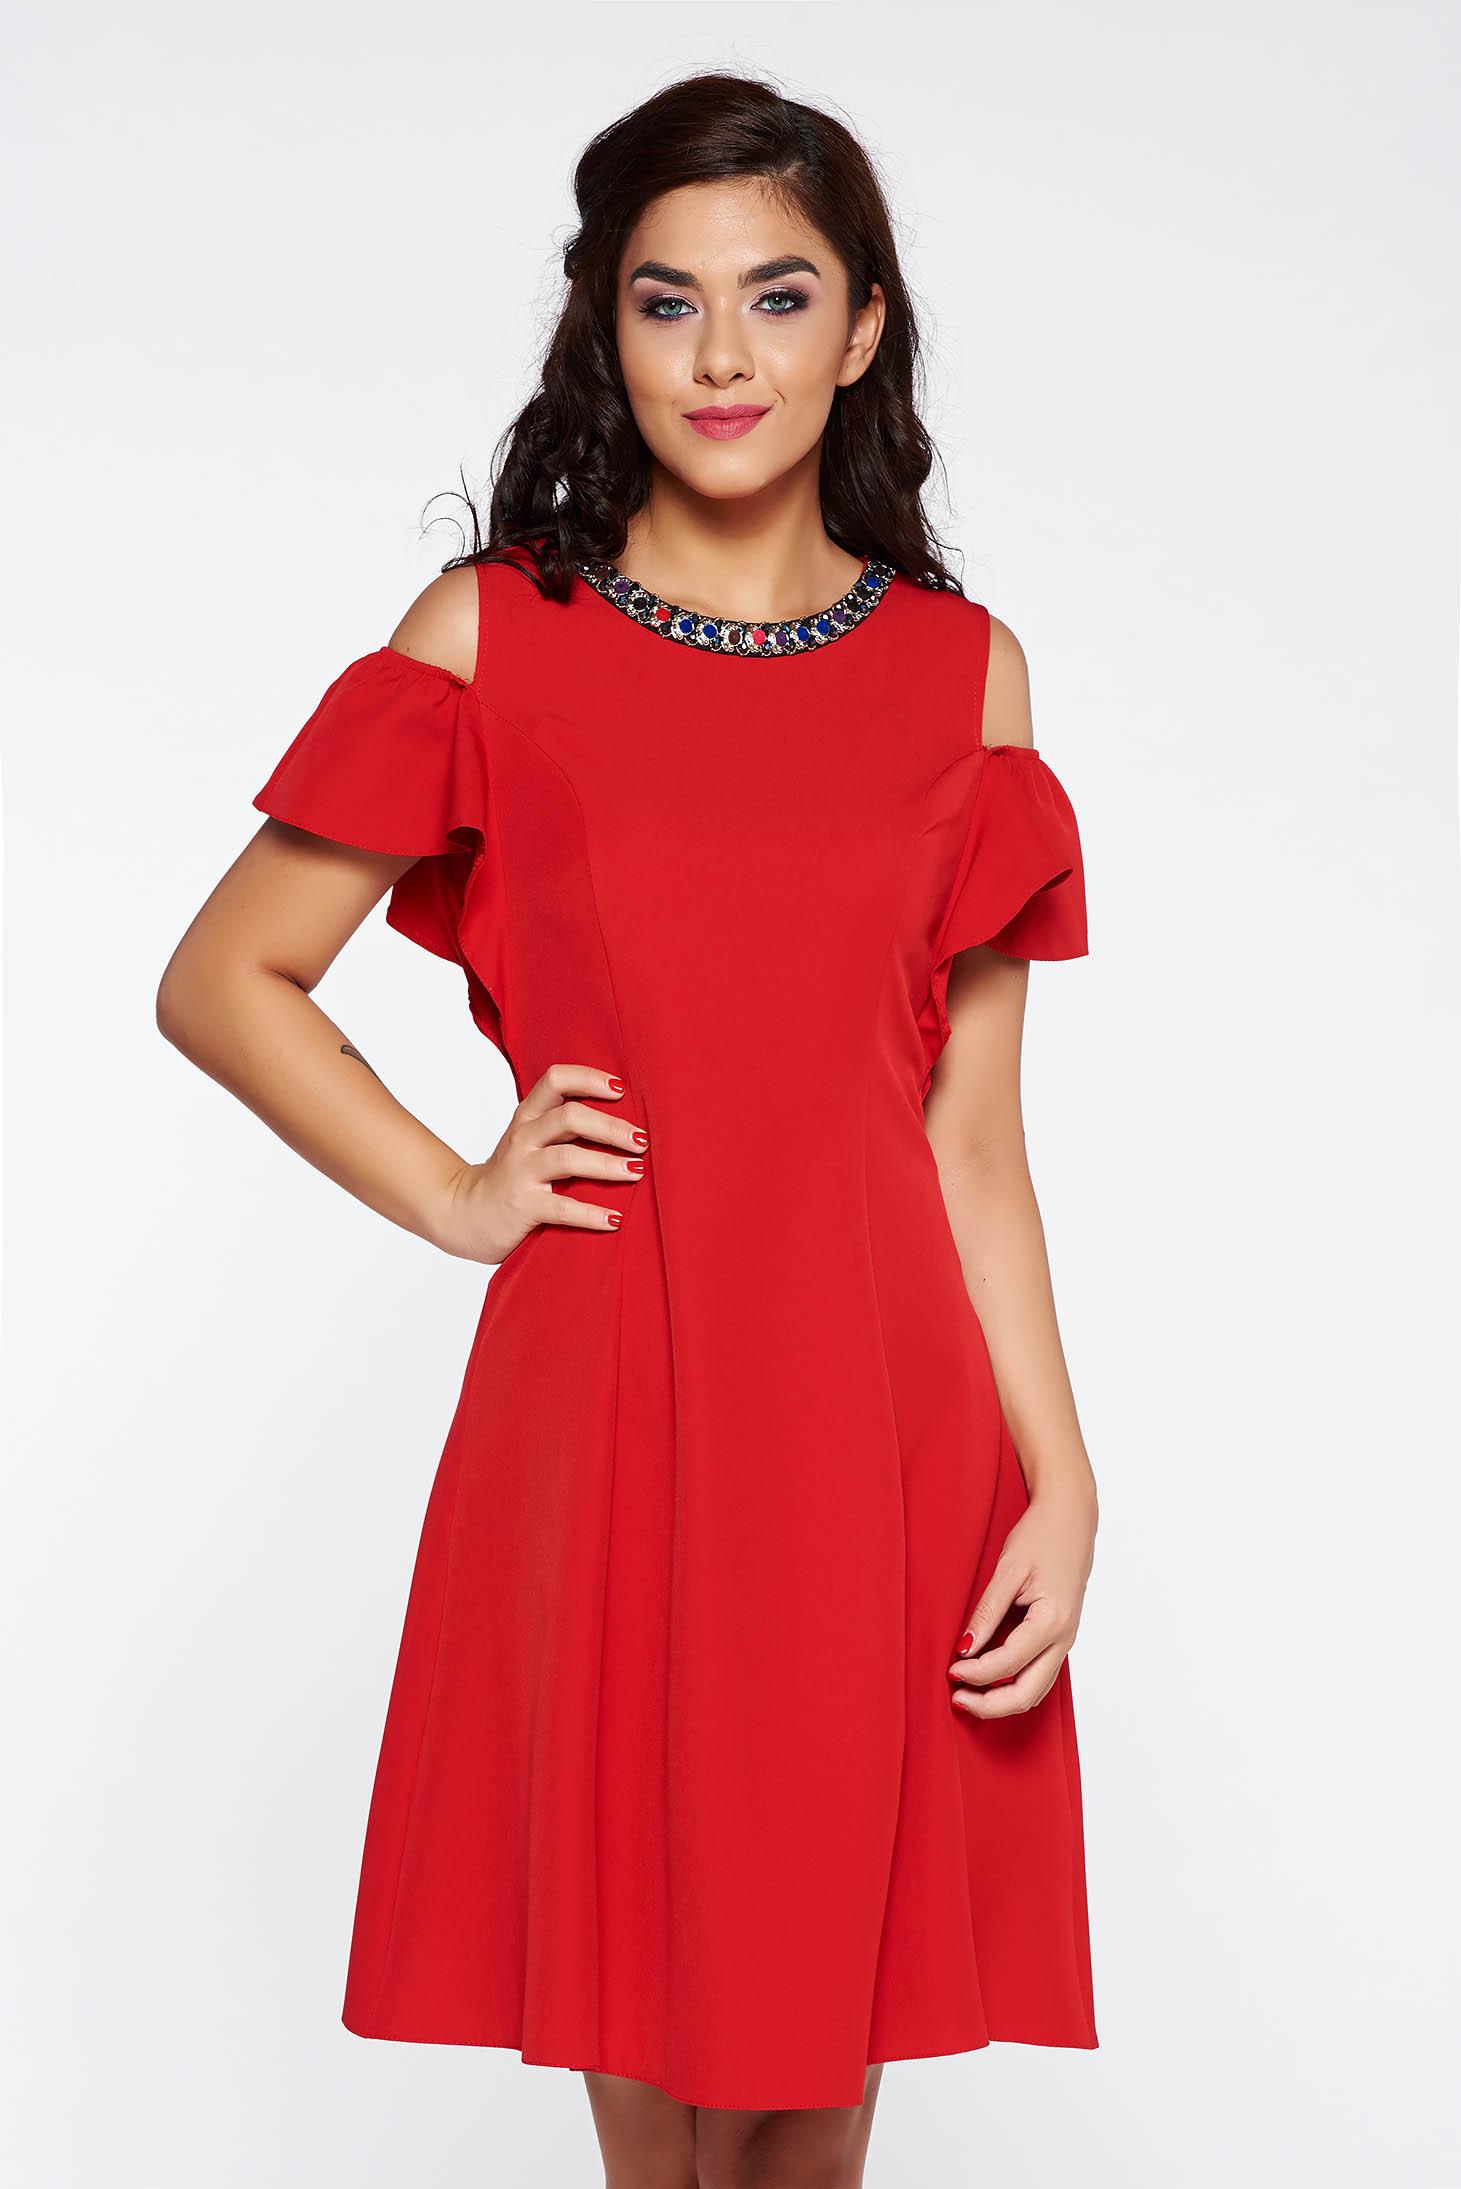 a7fb08f1058f red-elegant-off-shoulder-dress-flaring-cut-slightl-S037240-1-364443.jpg